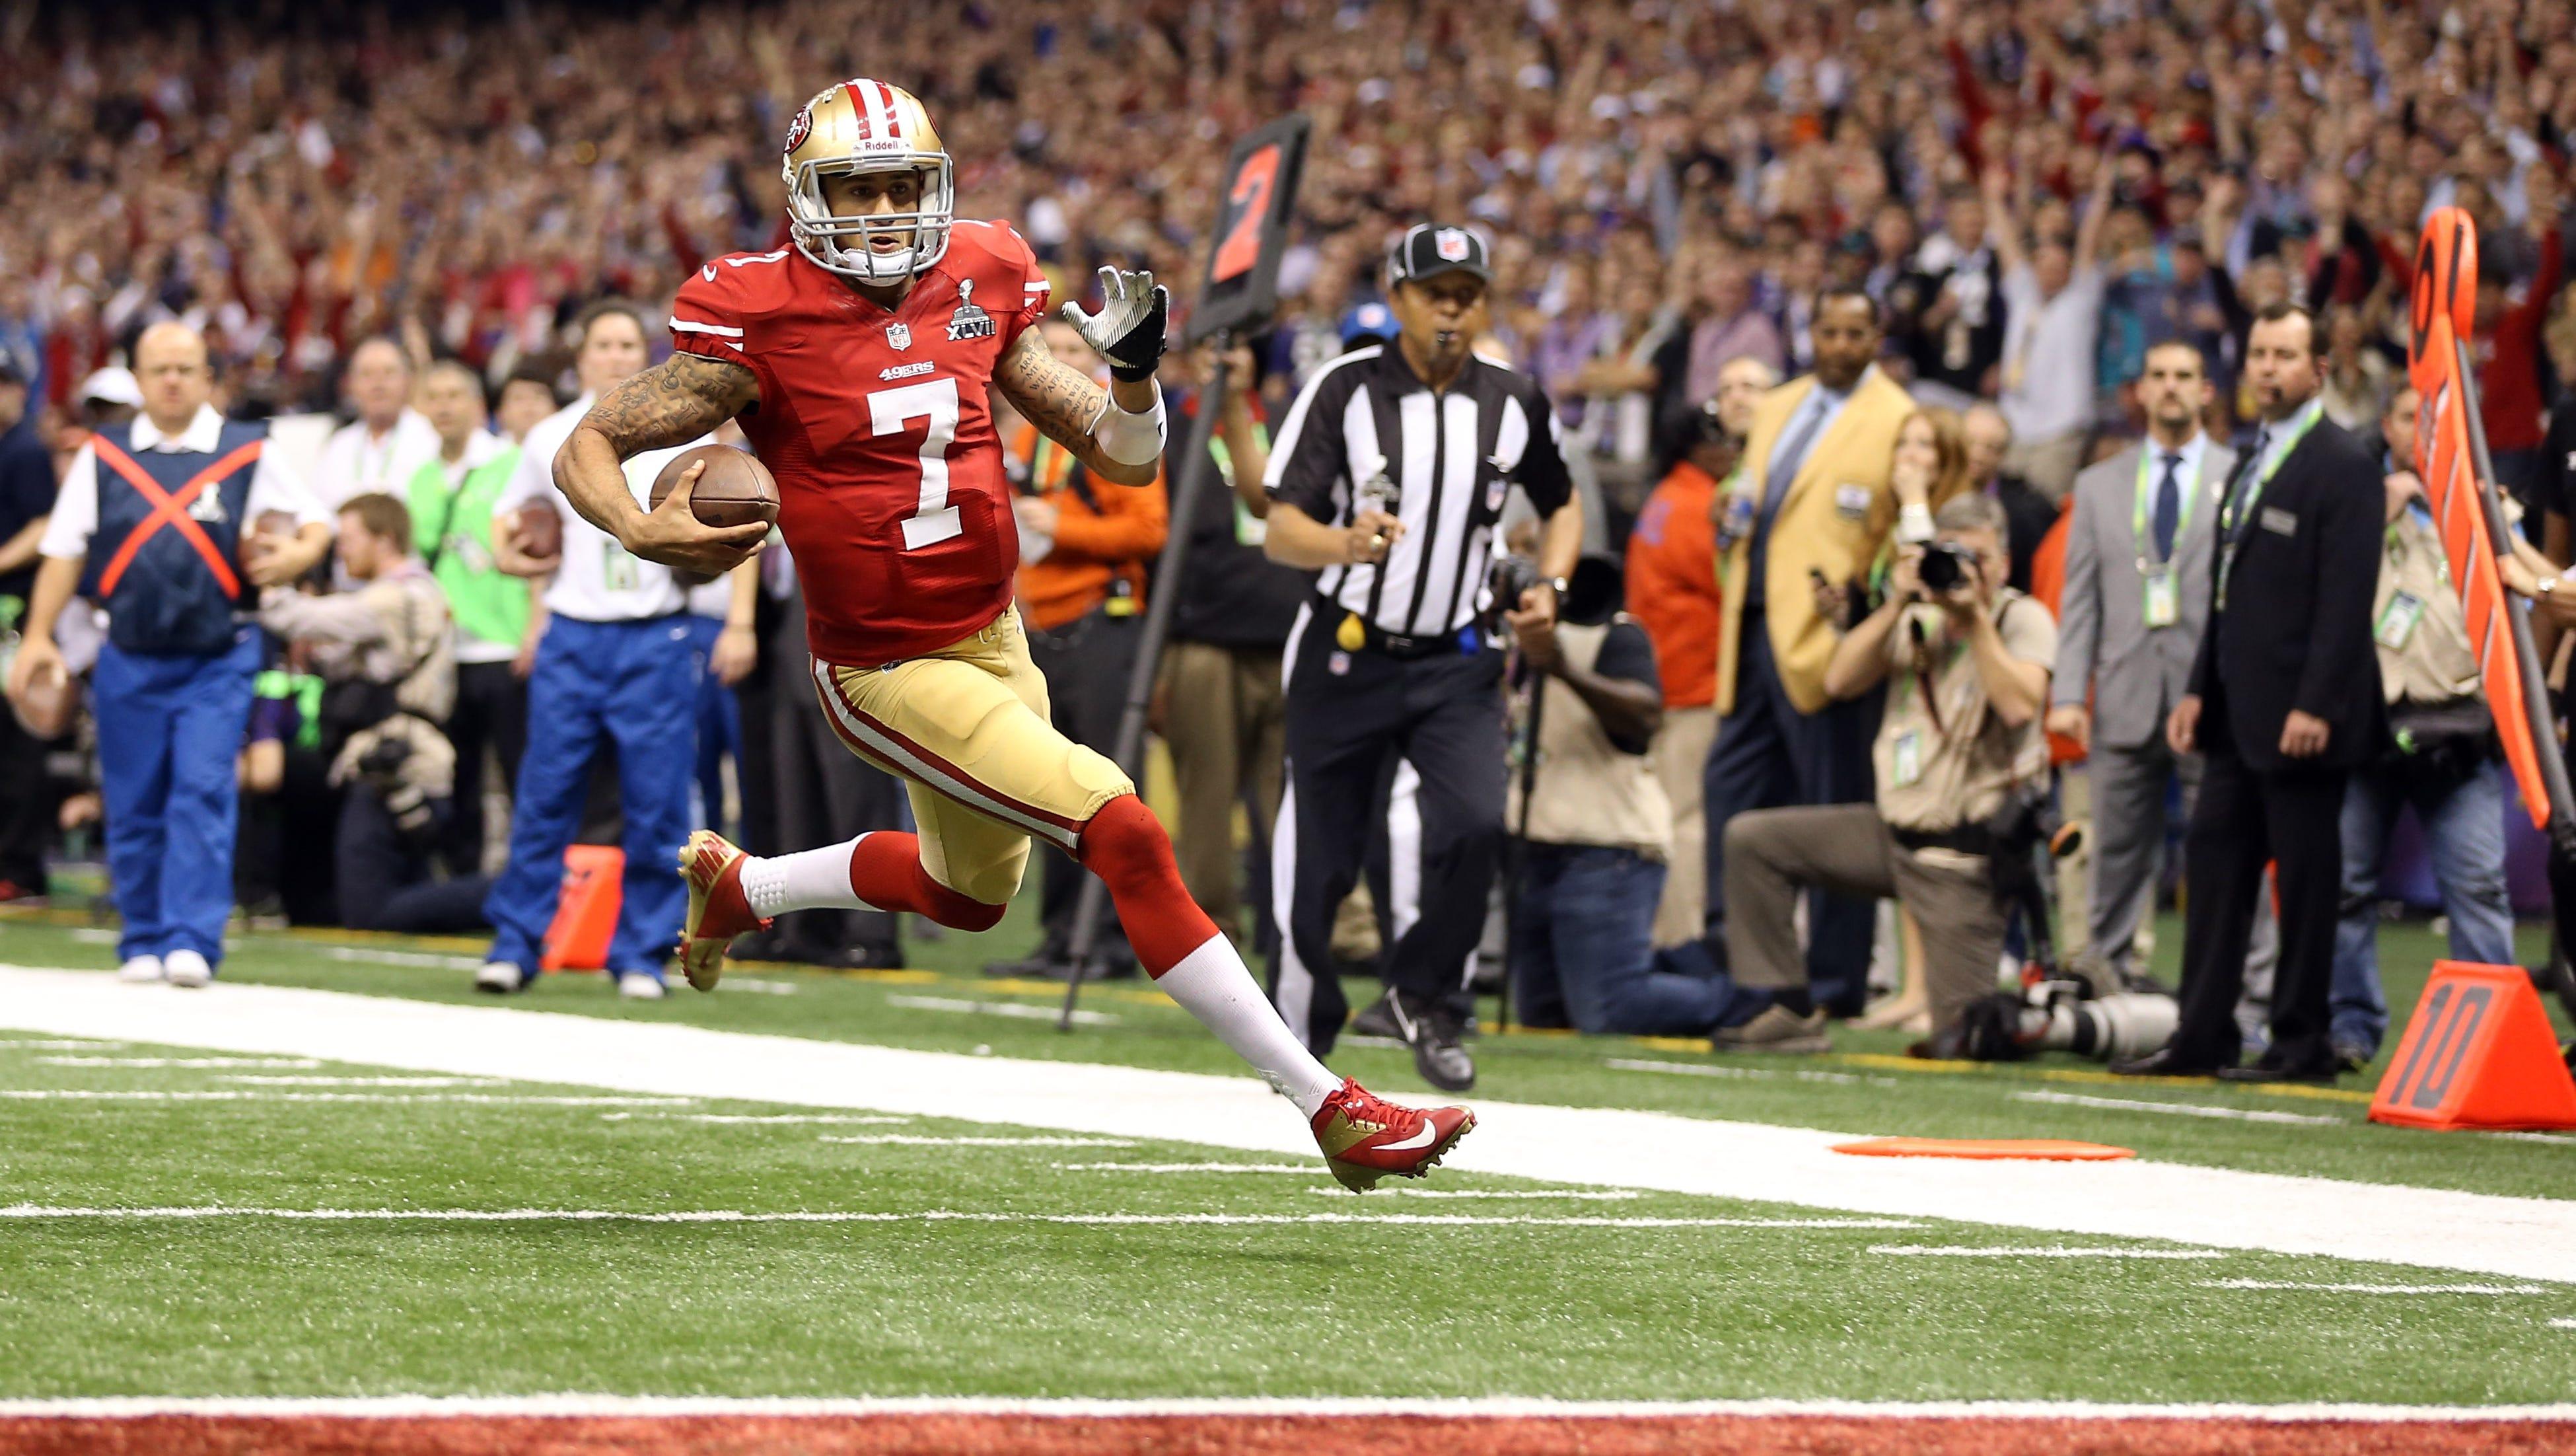 8. Colin Kaepernick,San Francisco 49ers